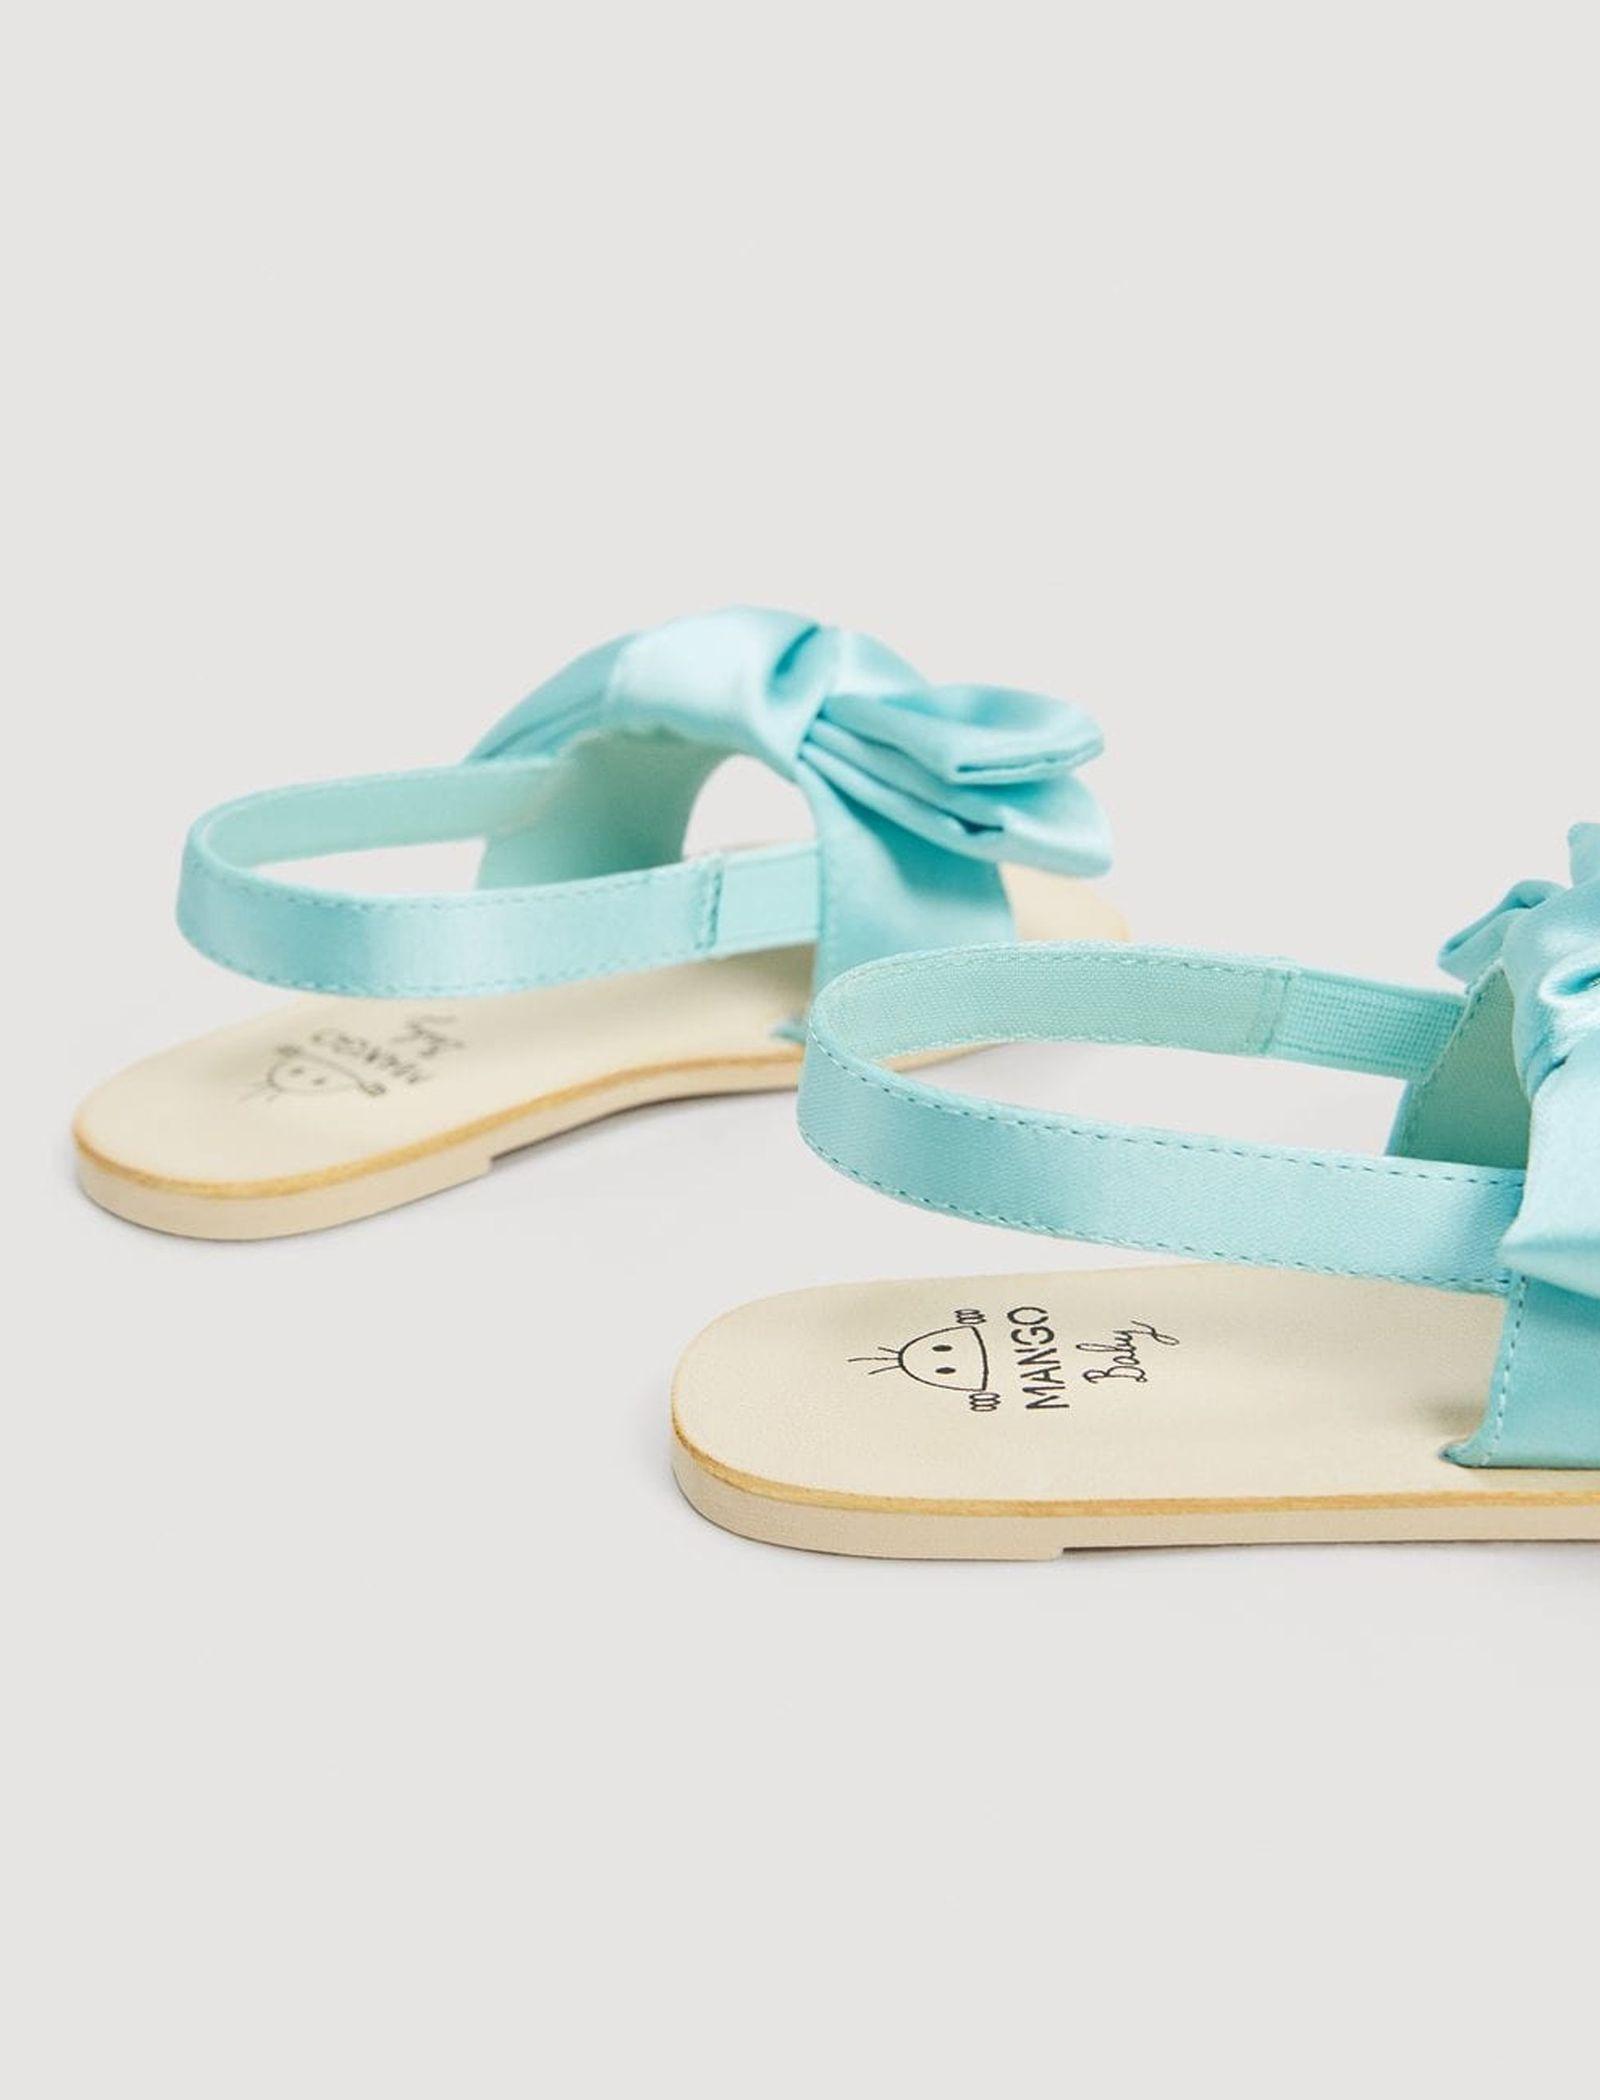 کفش بندی نوزادی دخترانه - مانگو - آبي روشن  - 4